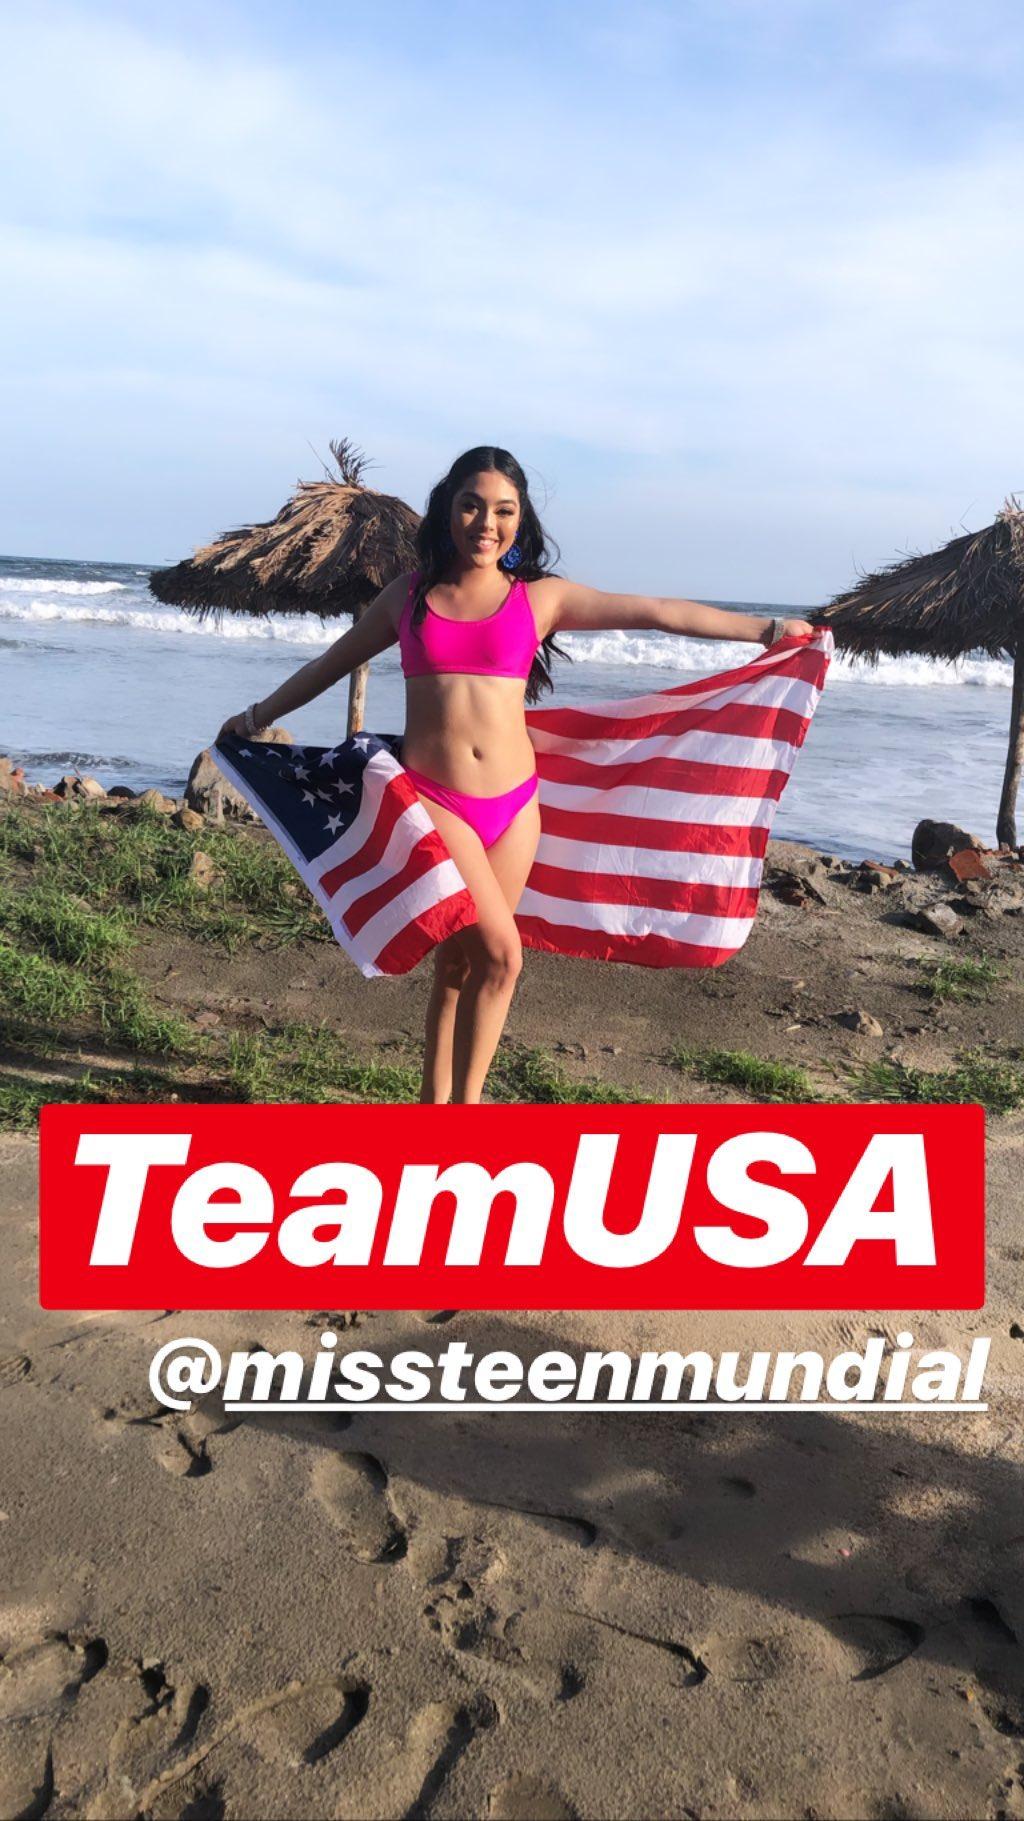 kristian de leon, miss teen mundial usa 2019/top 16 de teen universe 2018. - Página 4 60008010